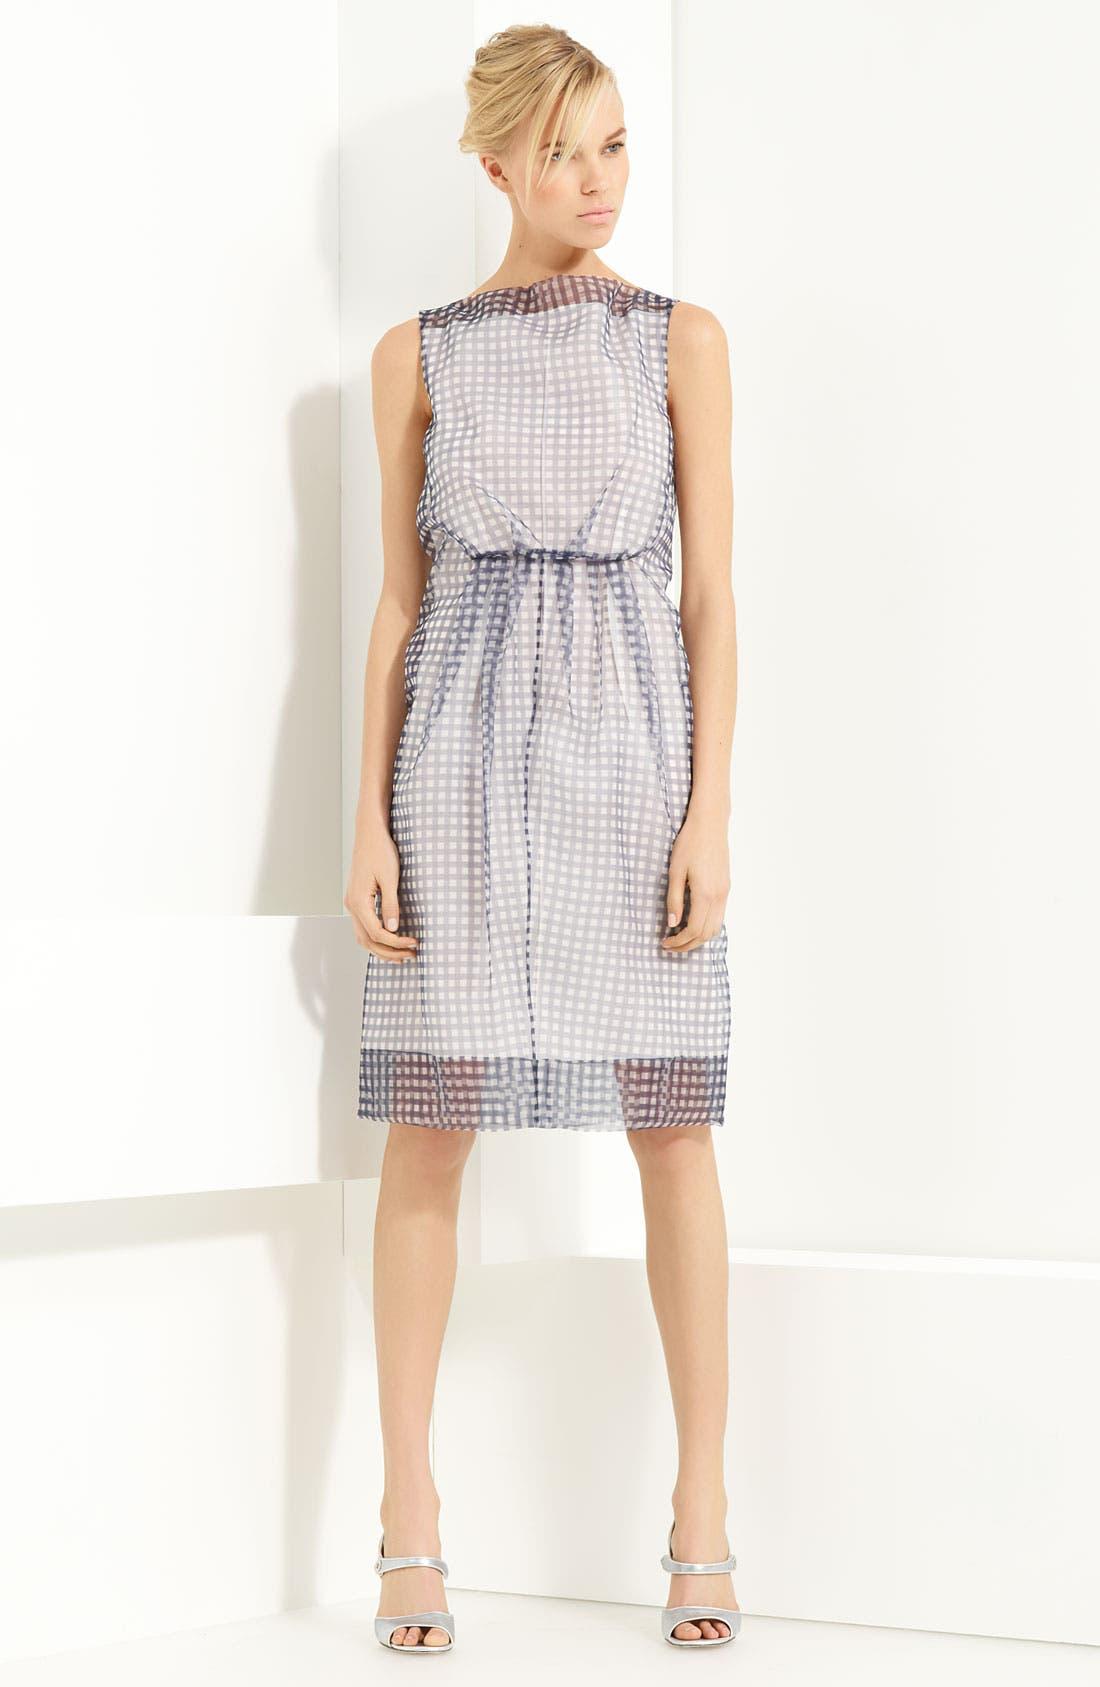 Alternate Image 1 Selected - MARC JACOBS Gingham Print Organza Dress